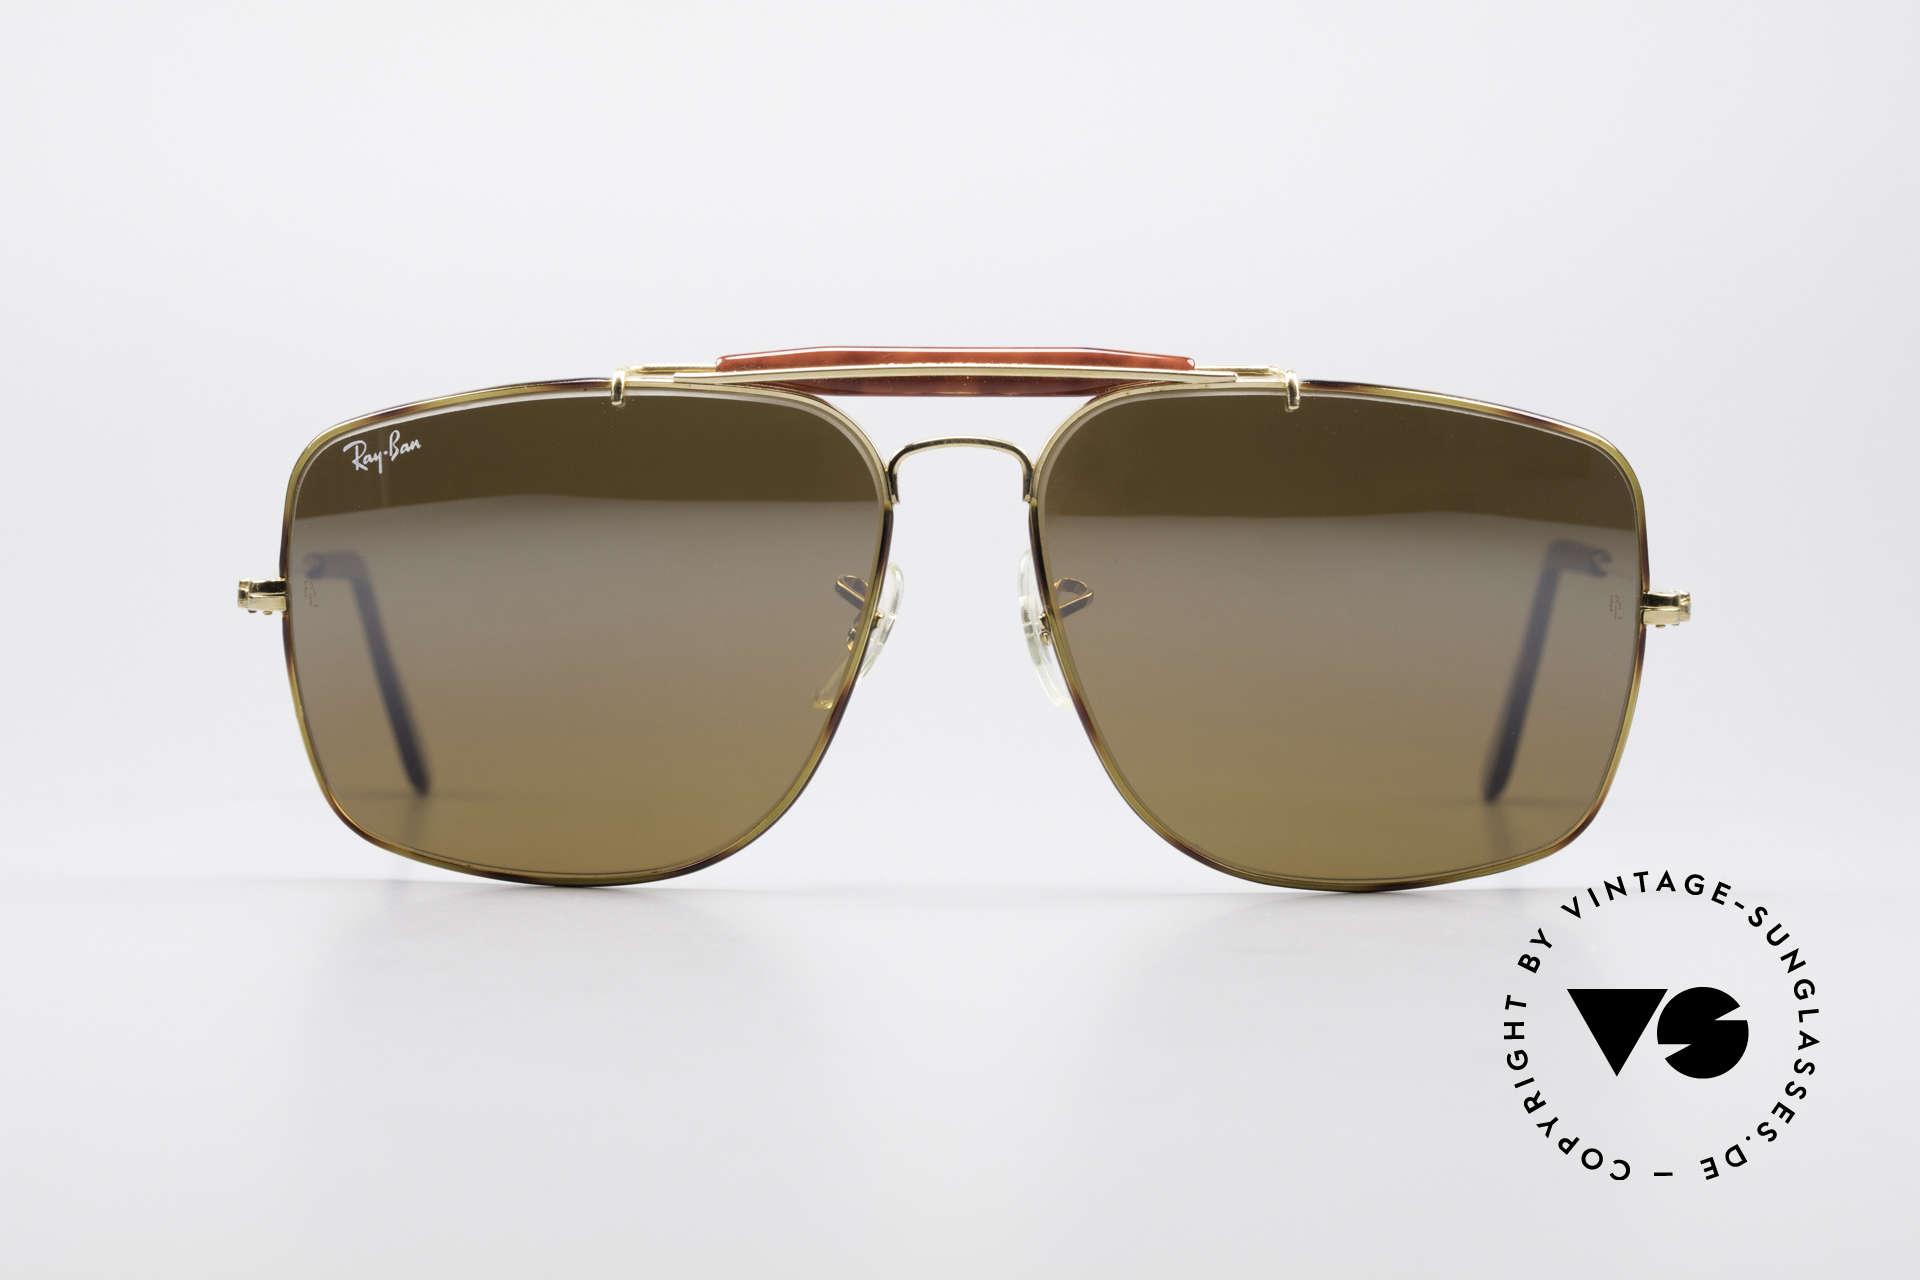 Sunglasses Ray Ban Explorer Large Tortuga Frame Brown